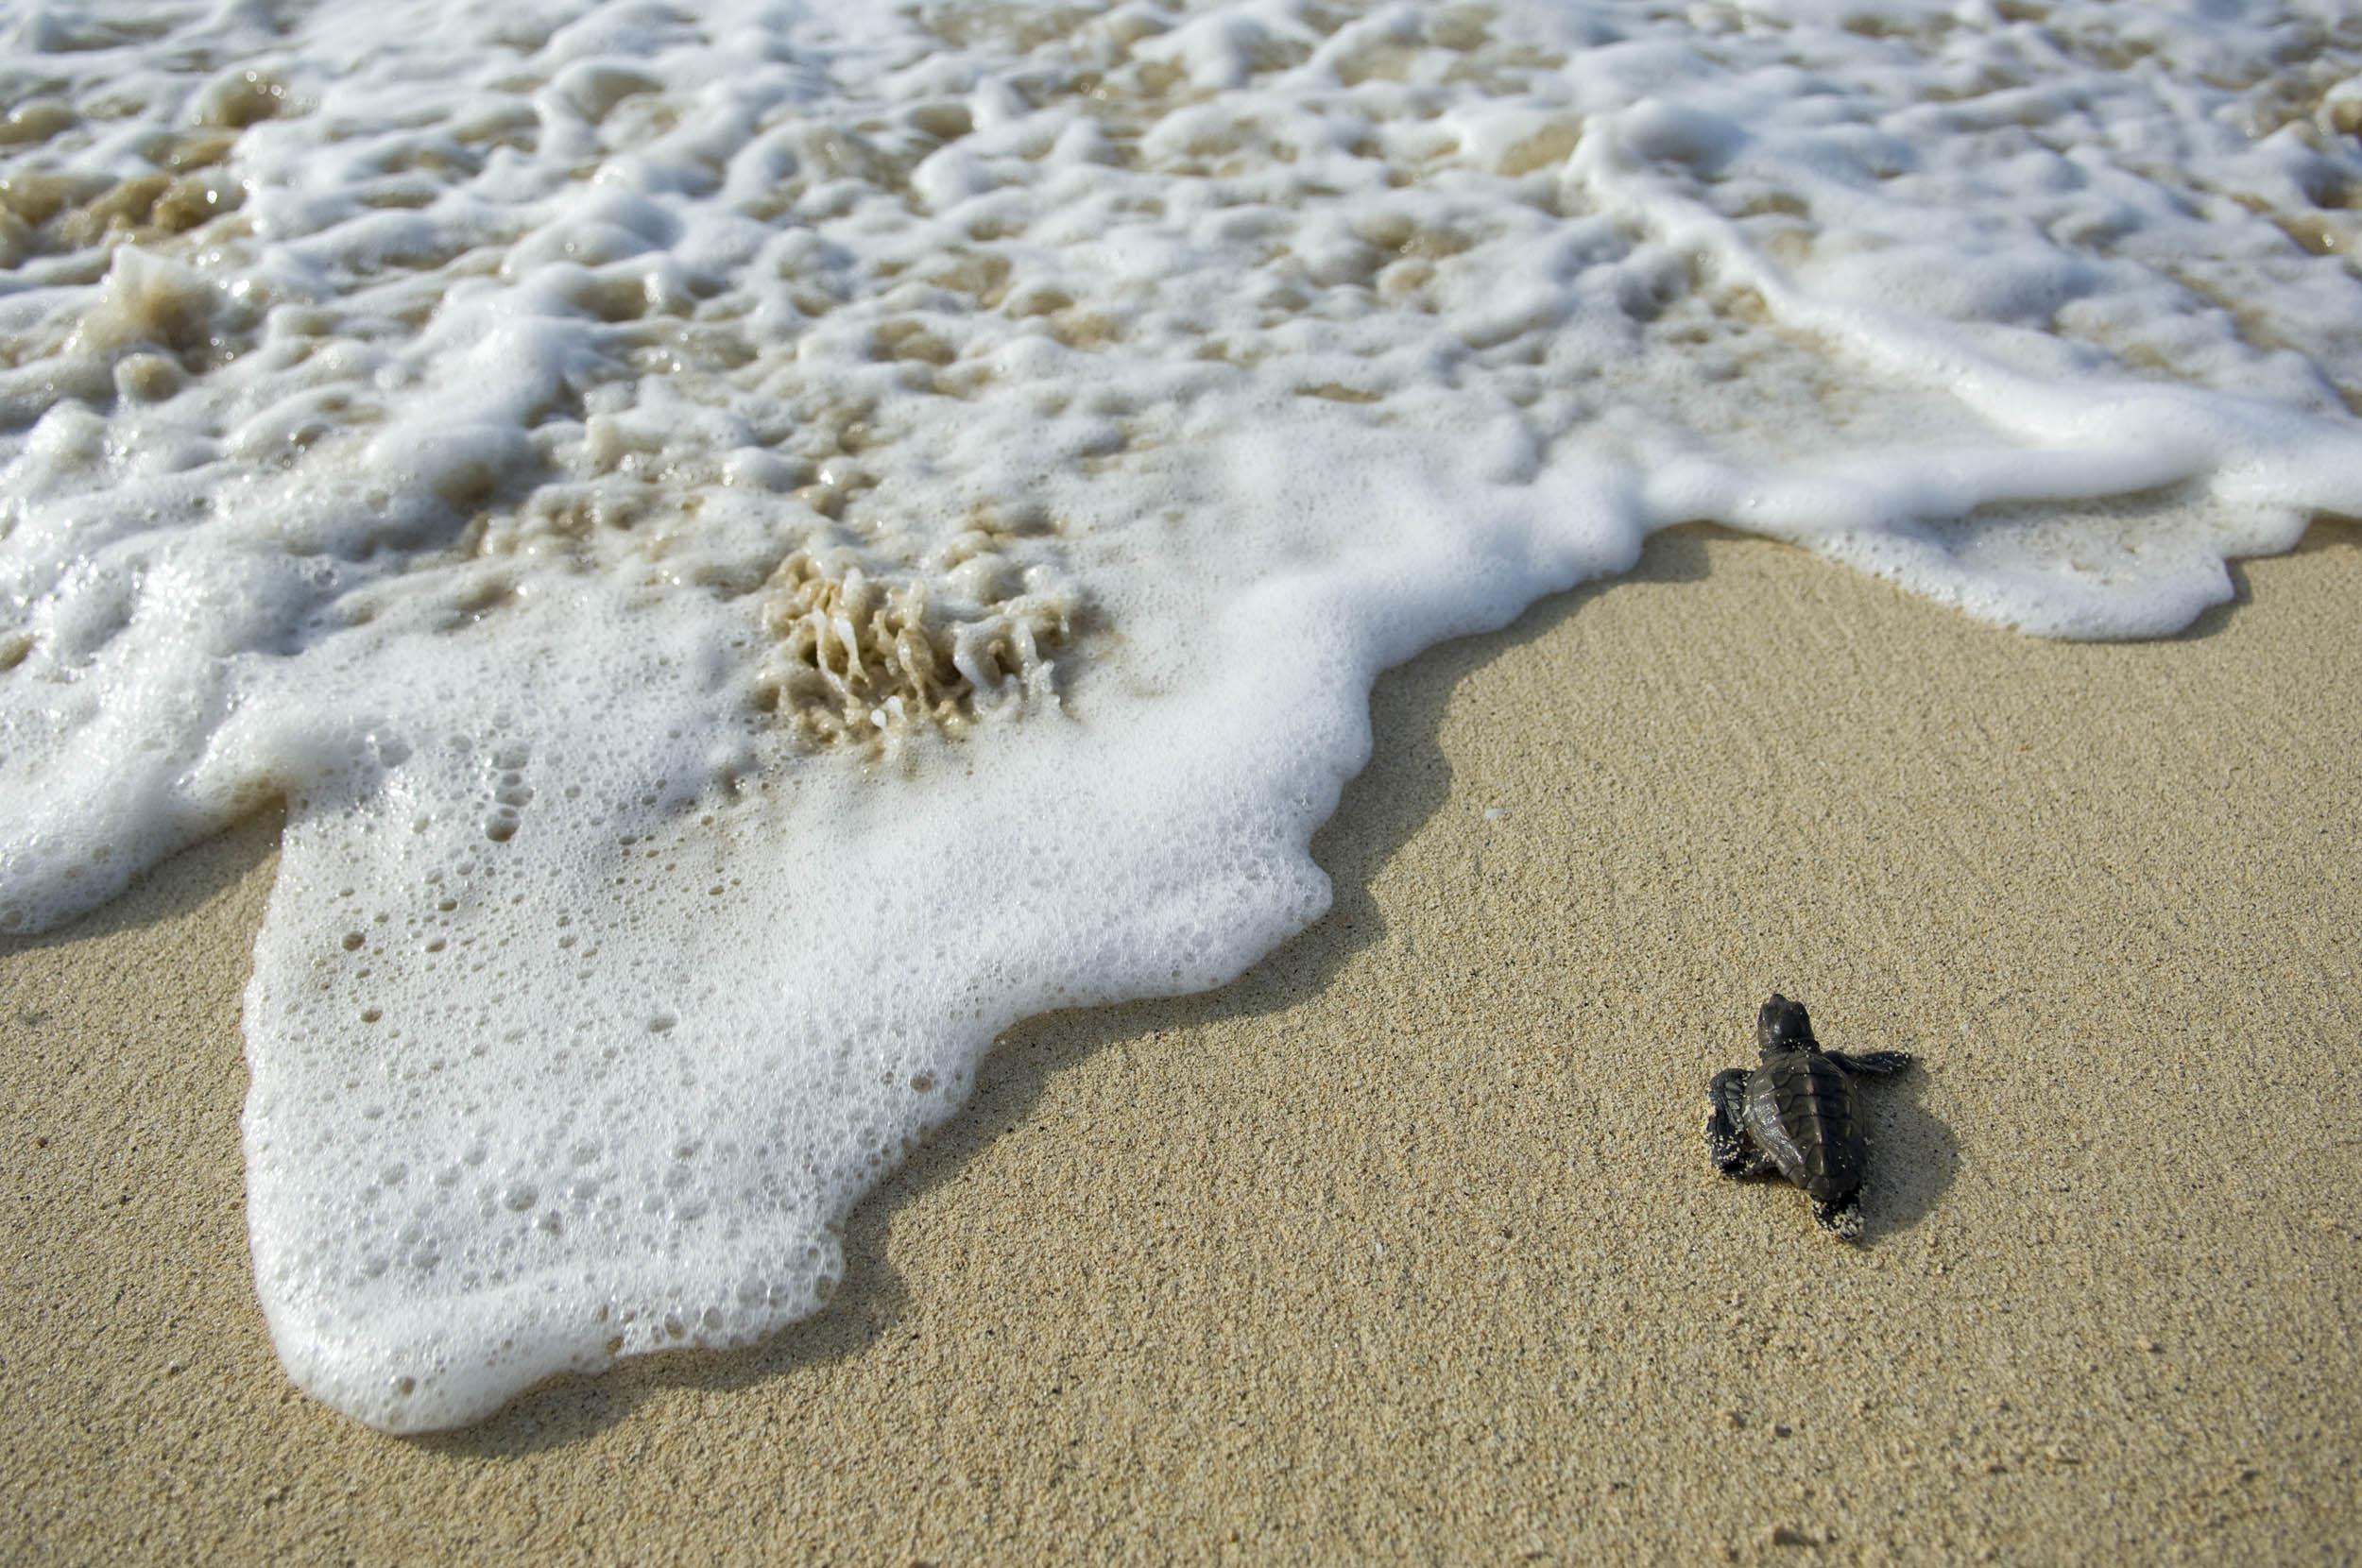 Tortuga boba, Cabo Verde - Gaia - Hector Garrido, Aerial and human photography